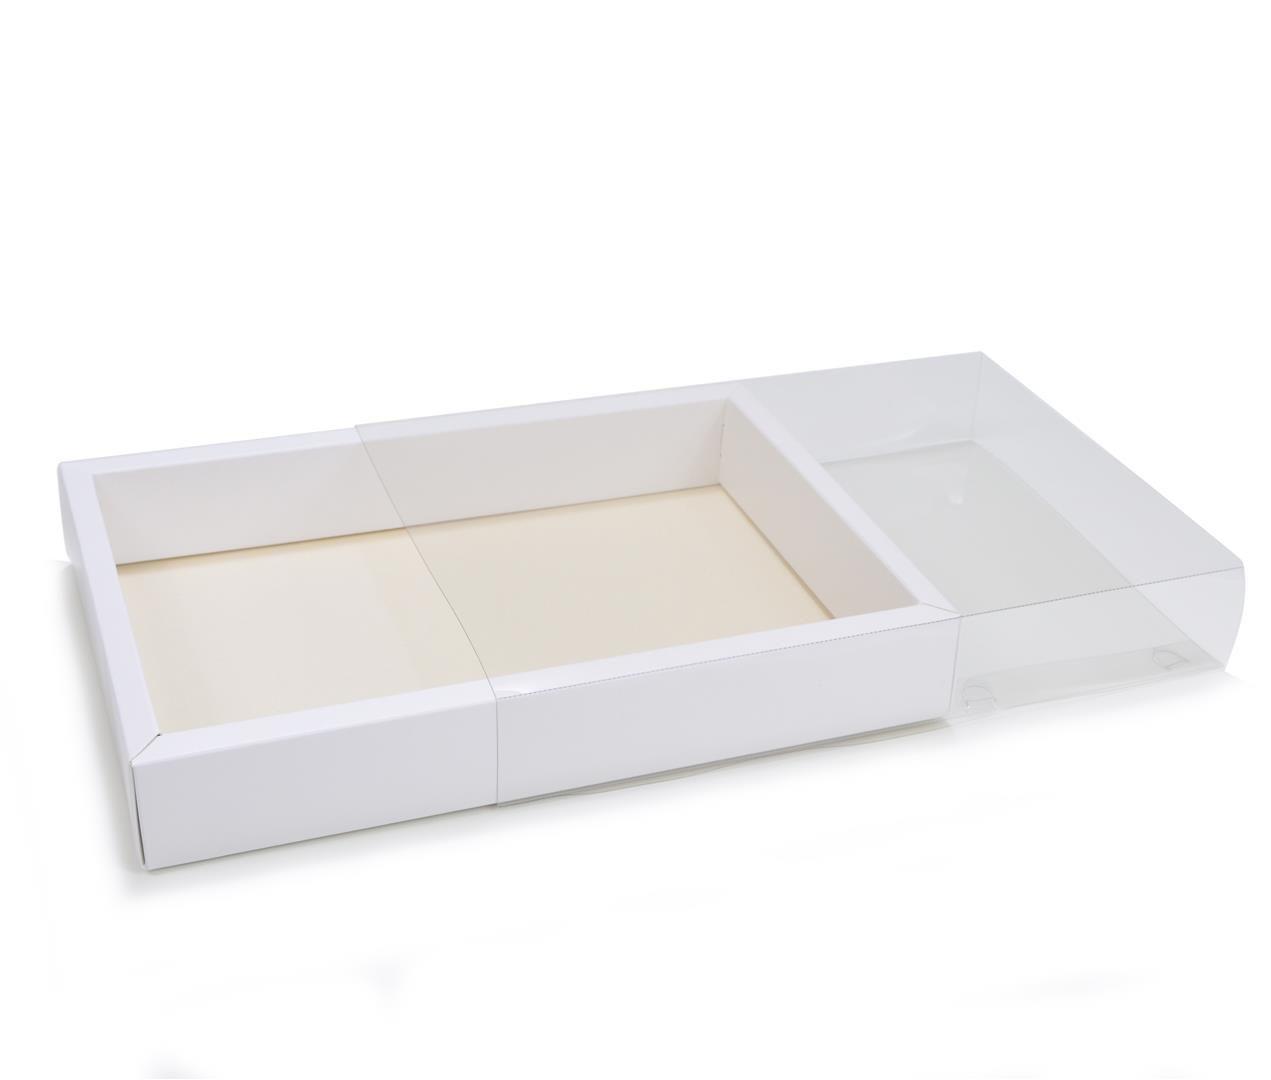 Ref 142 Branca - Caixa Gaveta c/ tampa Transparente - 25x17x4 cm - c/ 10 unidades